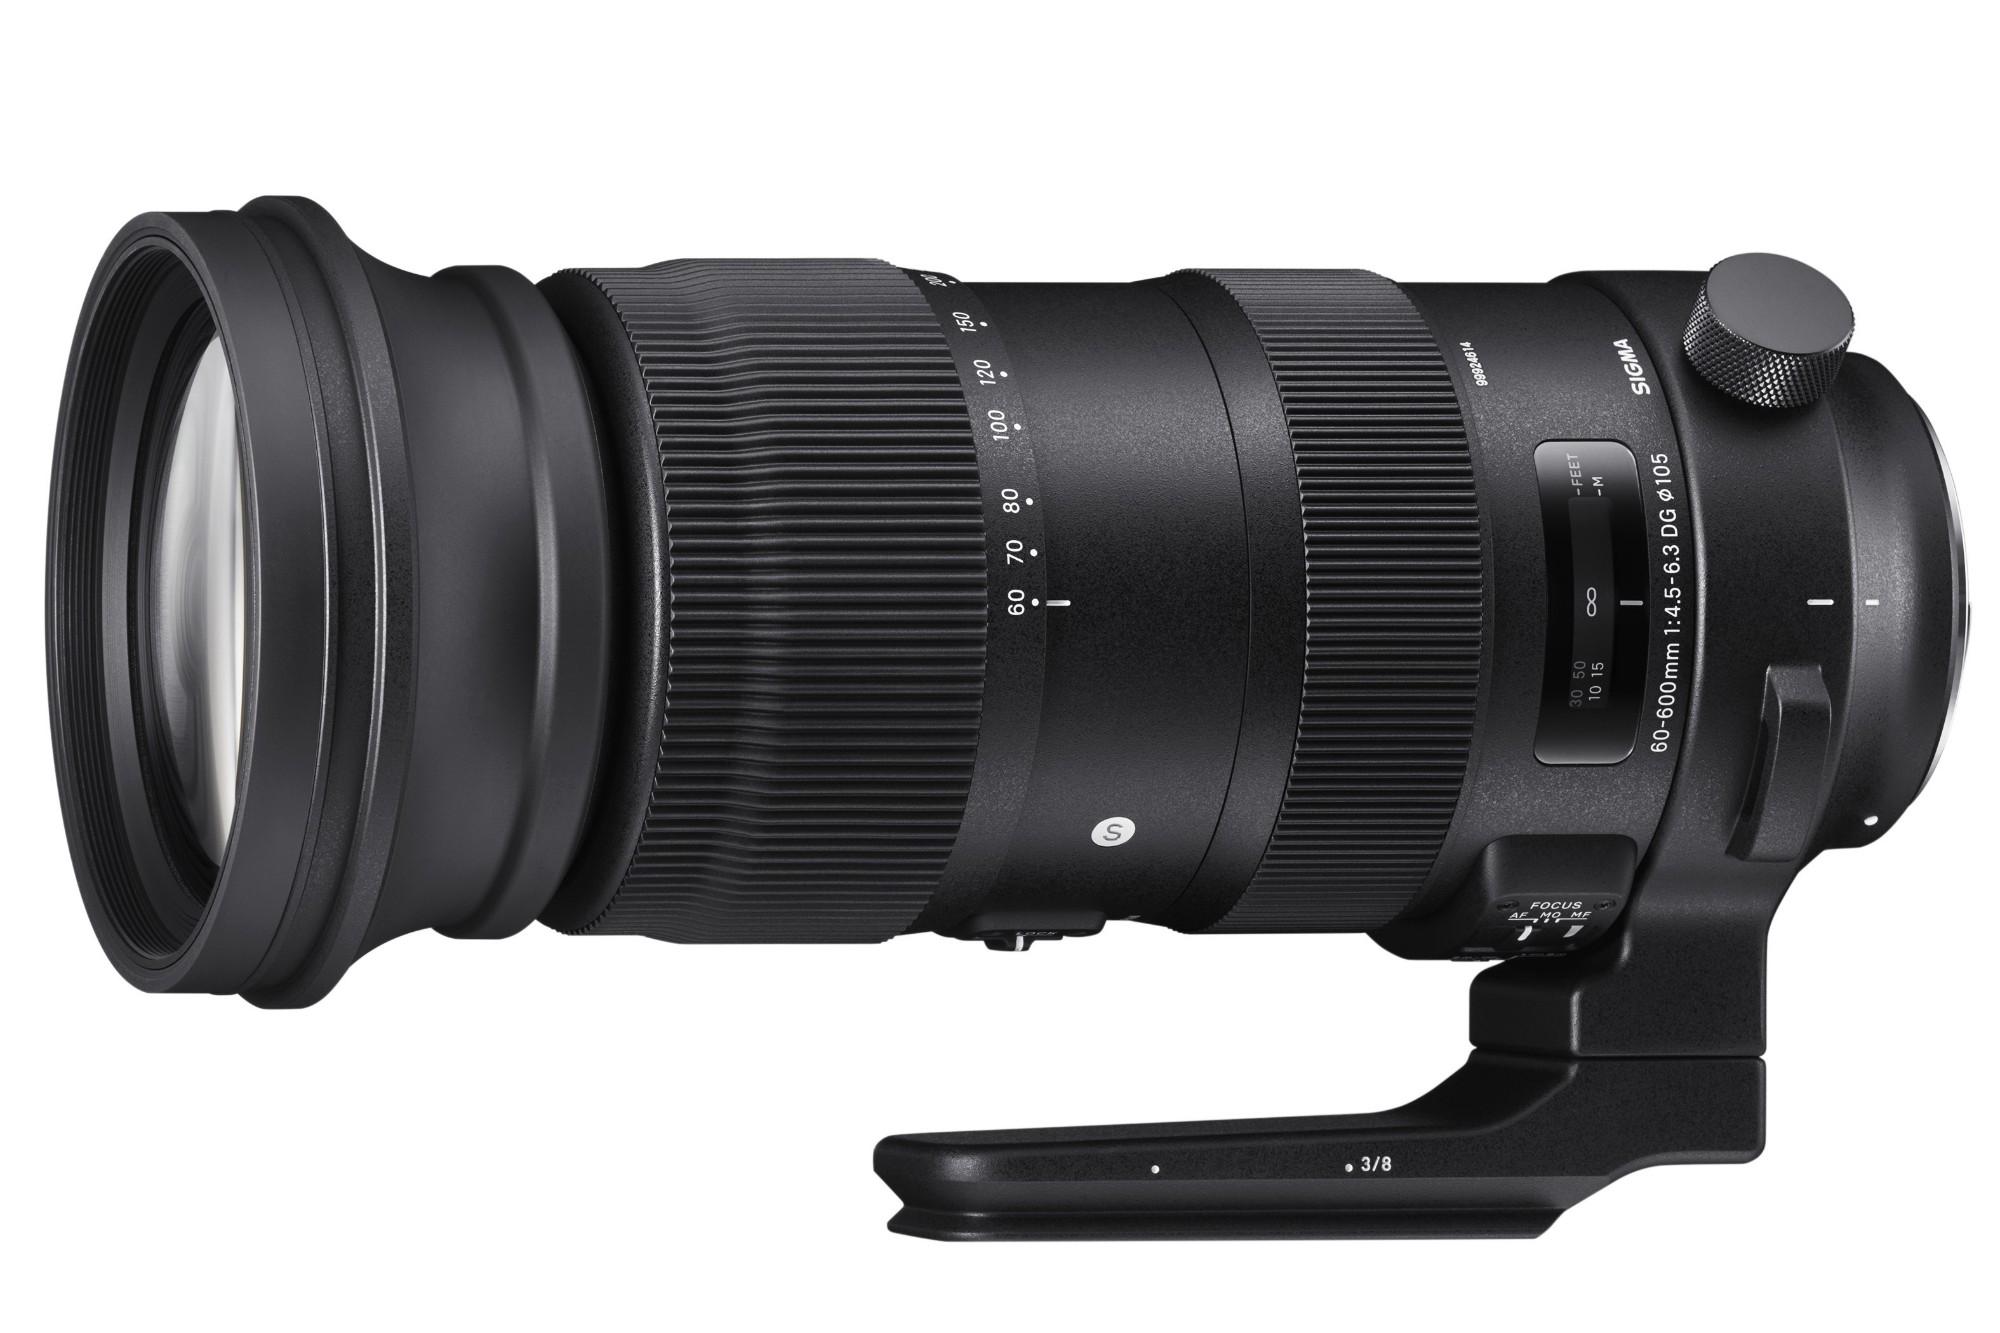 Sigma 60-600mm f/4.5-6.3 DG OS HSM Sport Telephoto Zoom Lens Nikon Fit